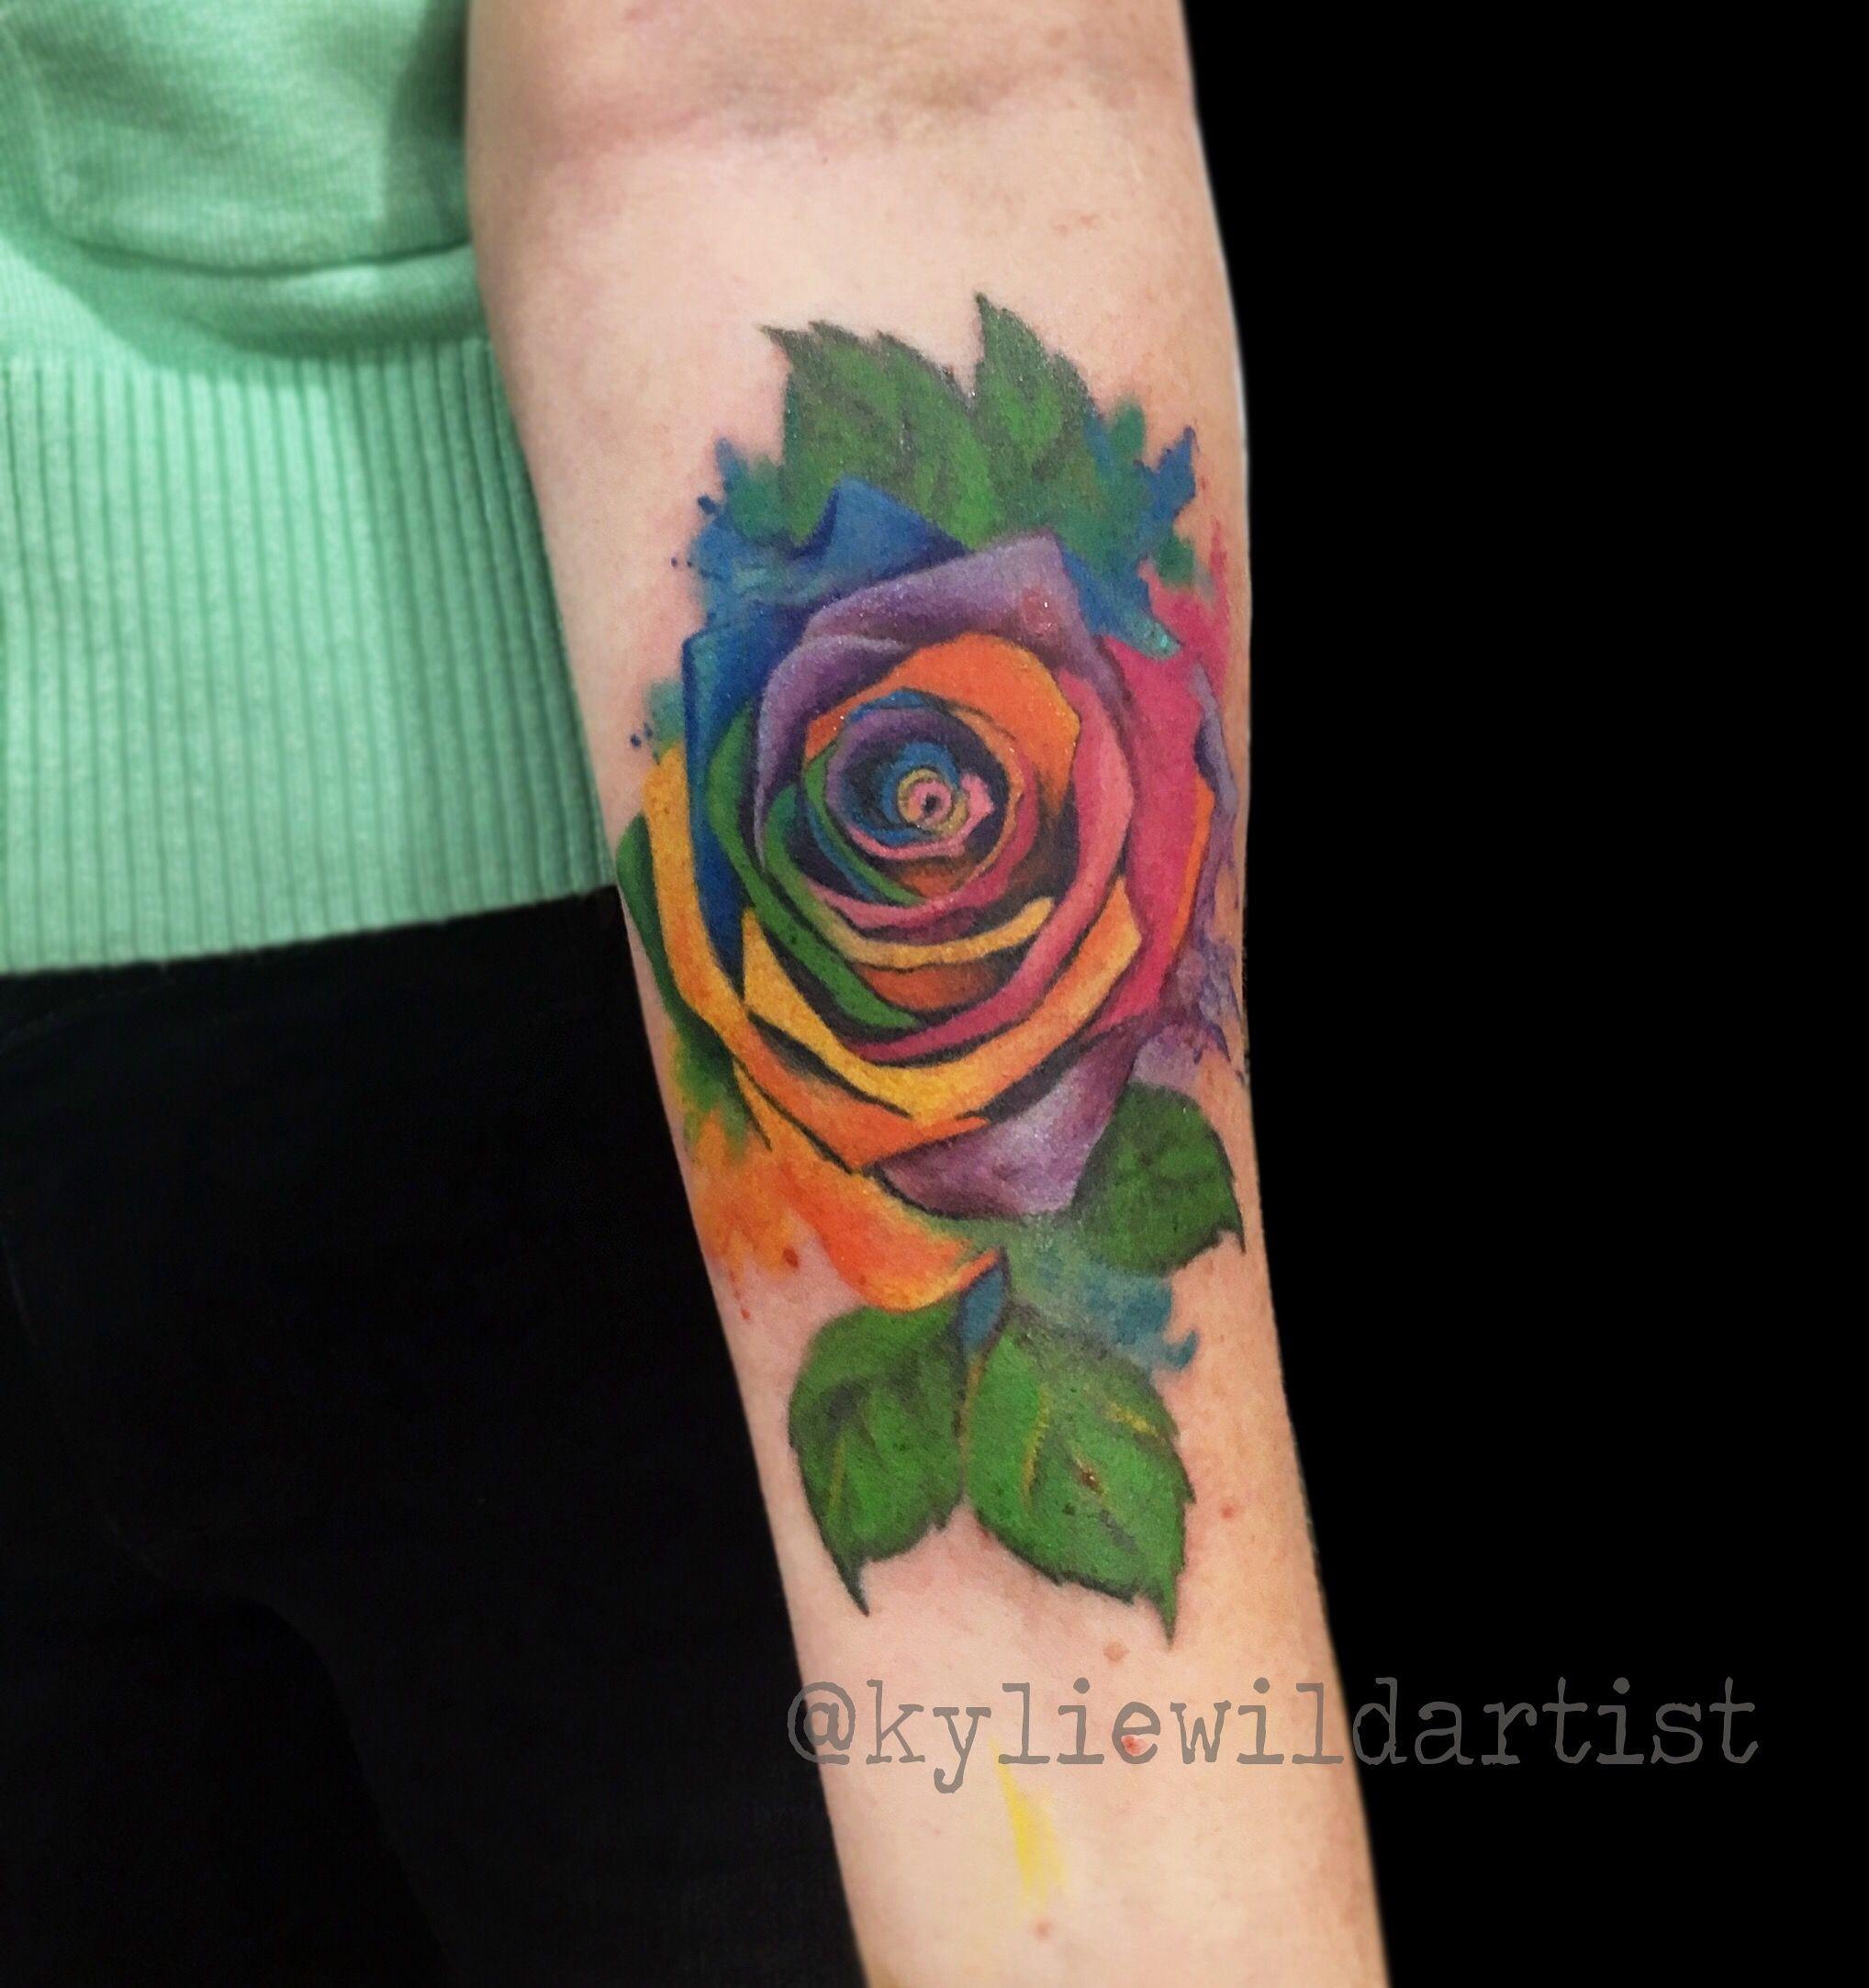 Rainbow Rose Watercolour Tattoo By Kylie Wild Heslop Www Artgonewild Com Au Coloured Rose Tattoo Rainbow Tattoos Watercolor Rose Tattoos